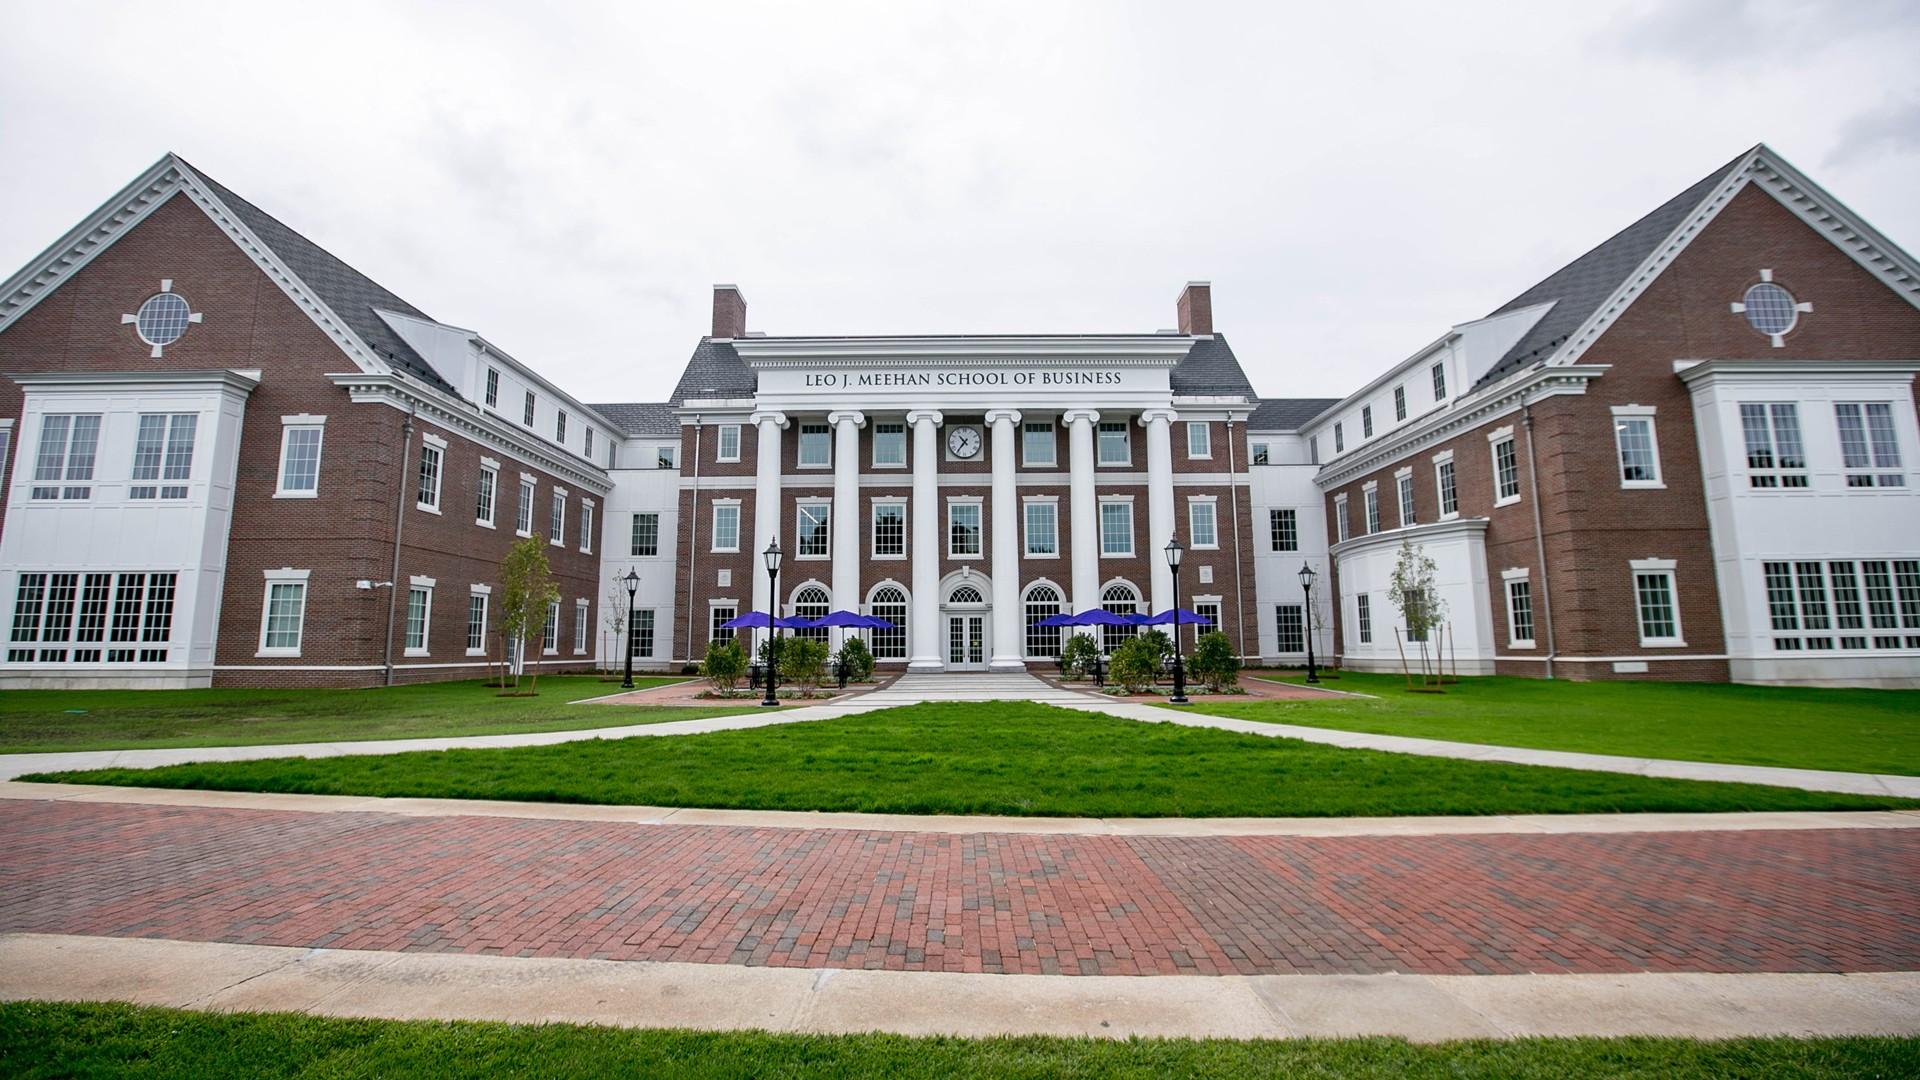 Leo J. Meehan School of Business